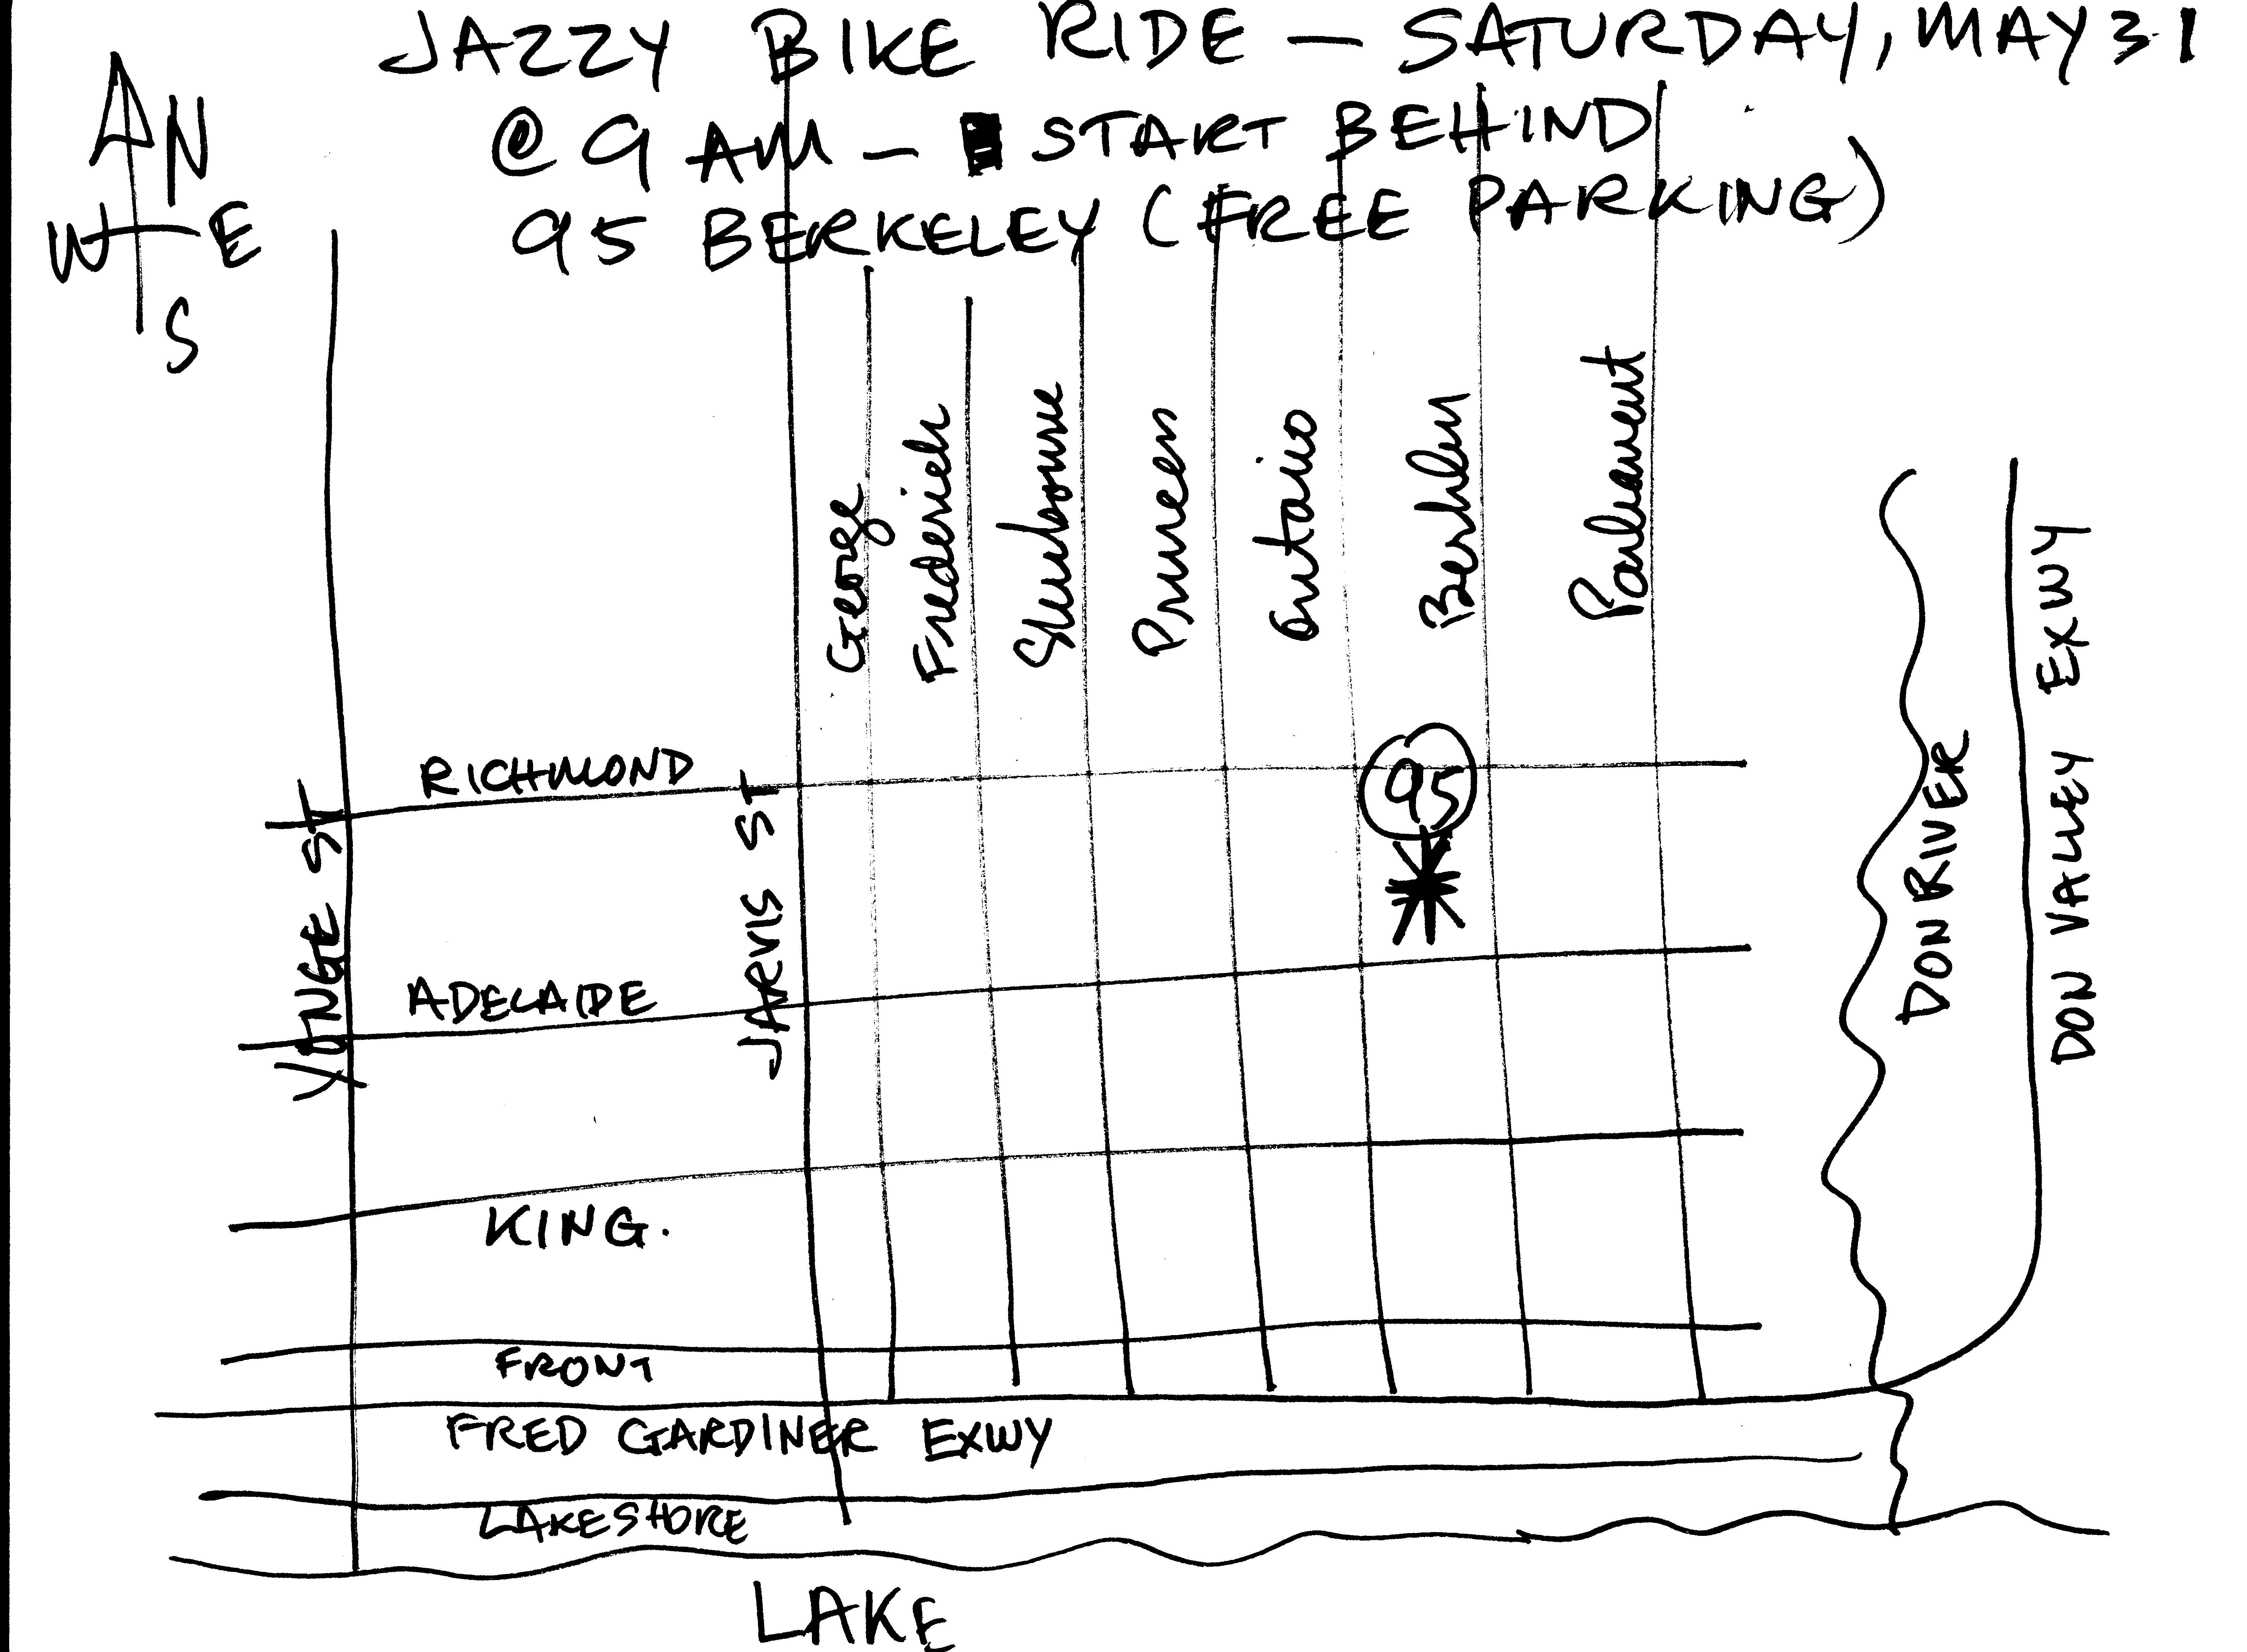 mapofjazzybikeridea.jpg